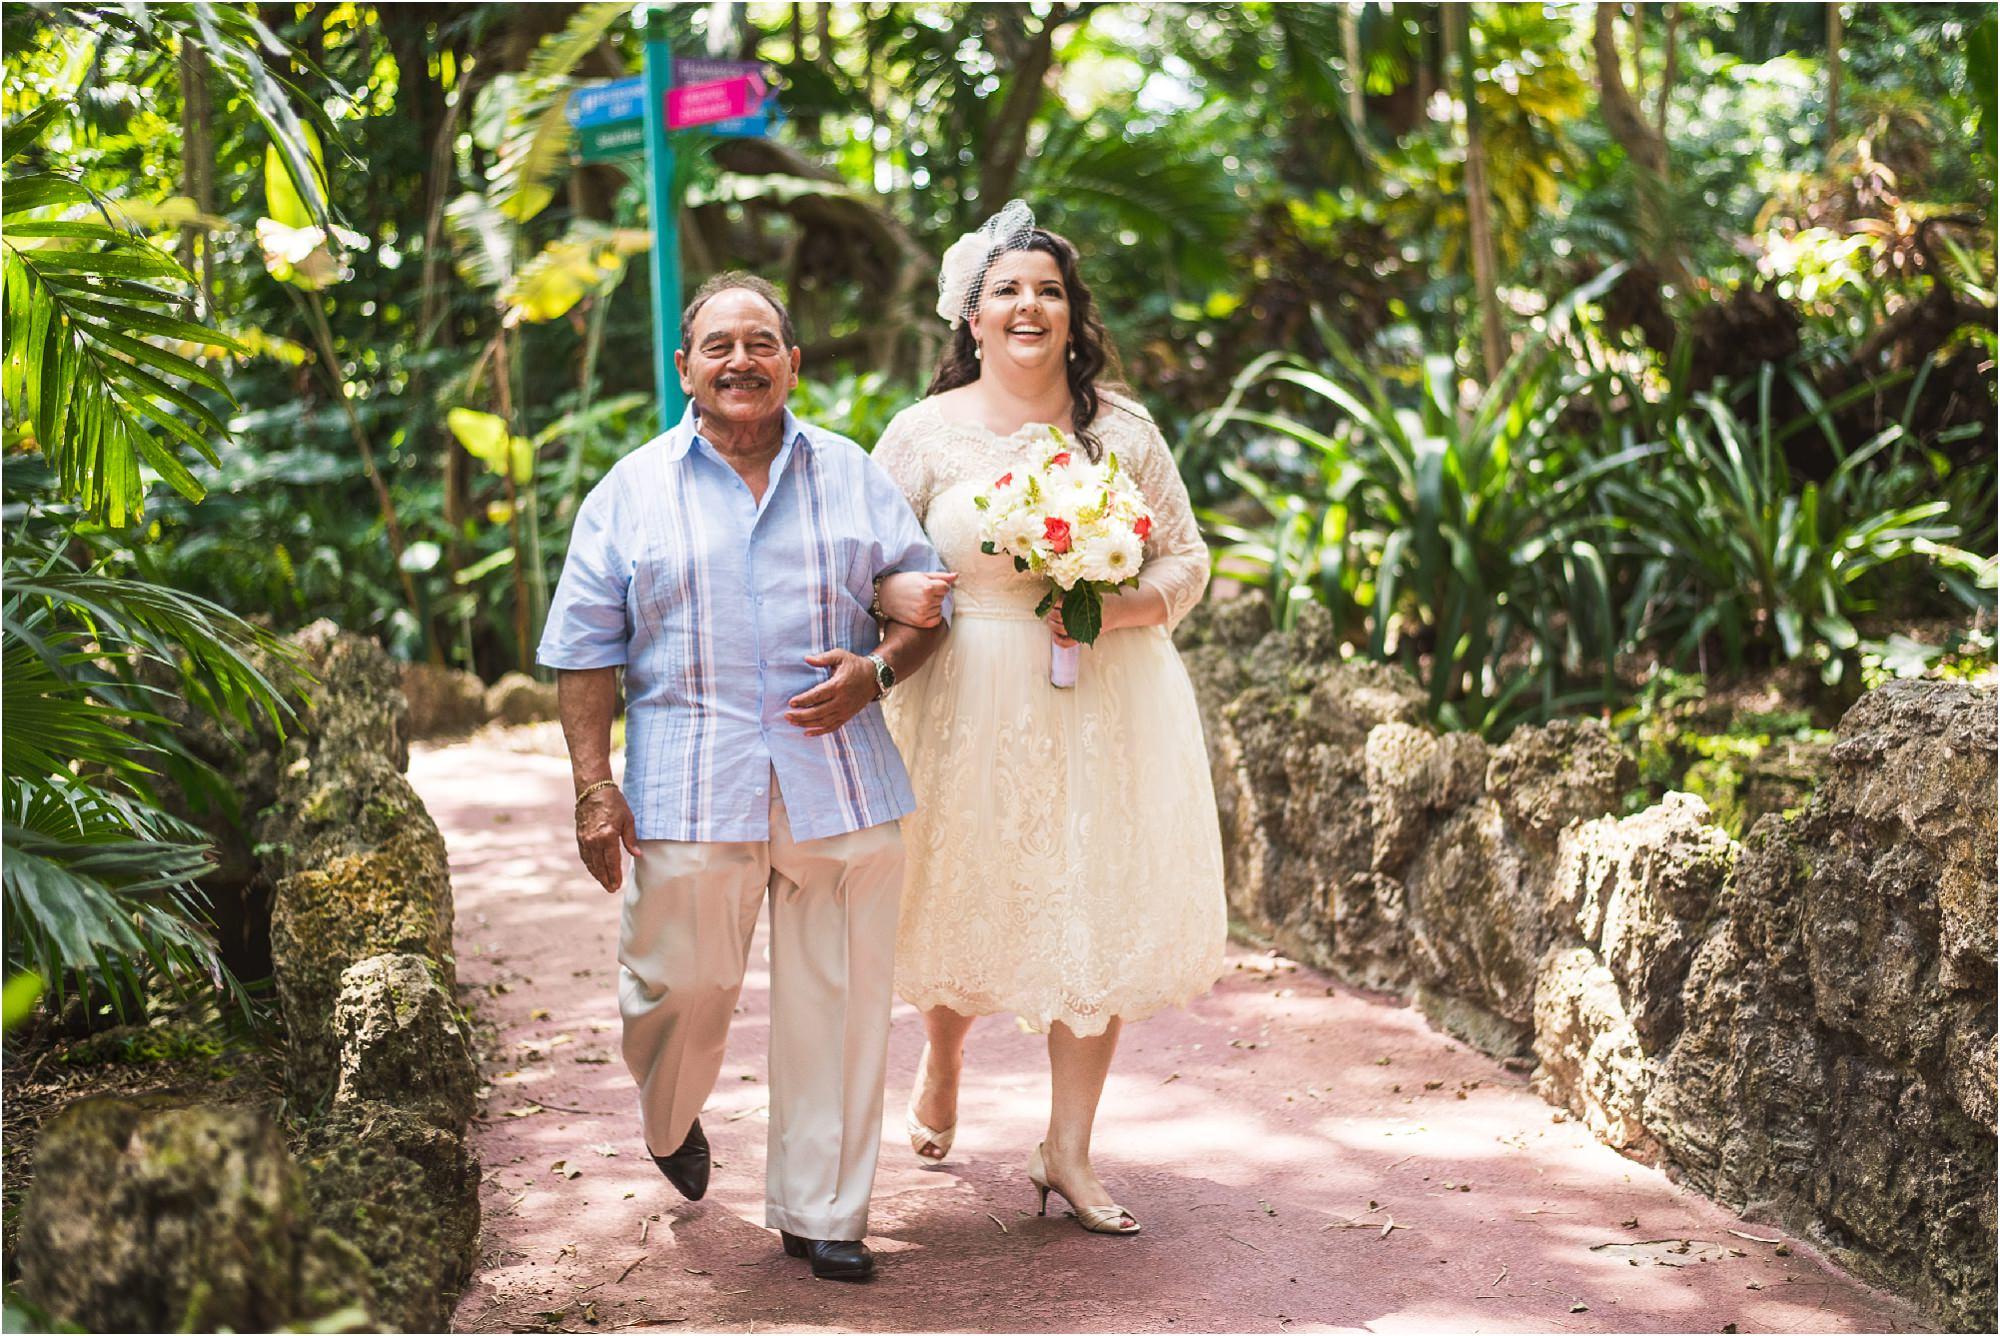 outdoor-rustic-pincrest-gardens-wedding-miami-photographer-jessenia-gonzalez_1028.jpg